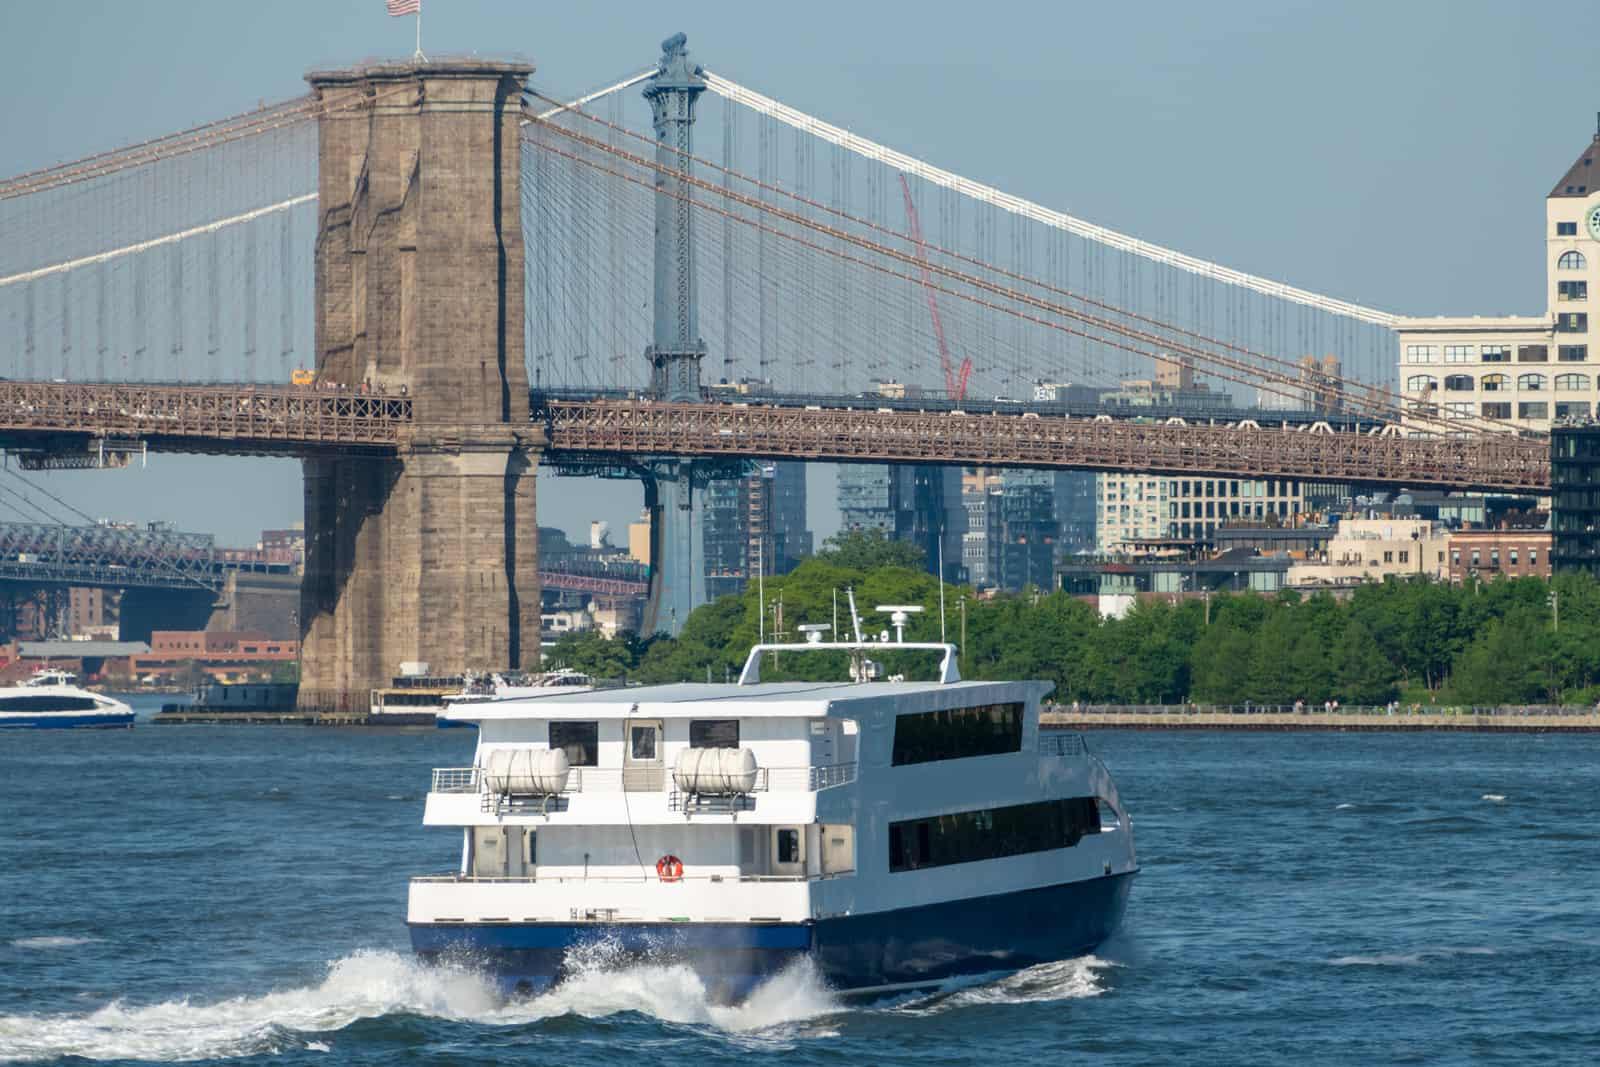 Electchester Queens, New York Private Investigator